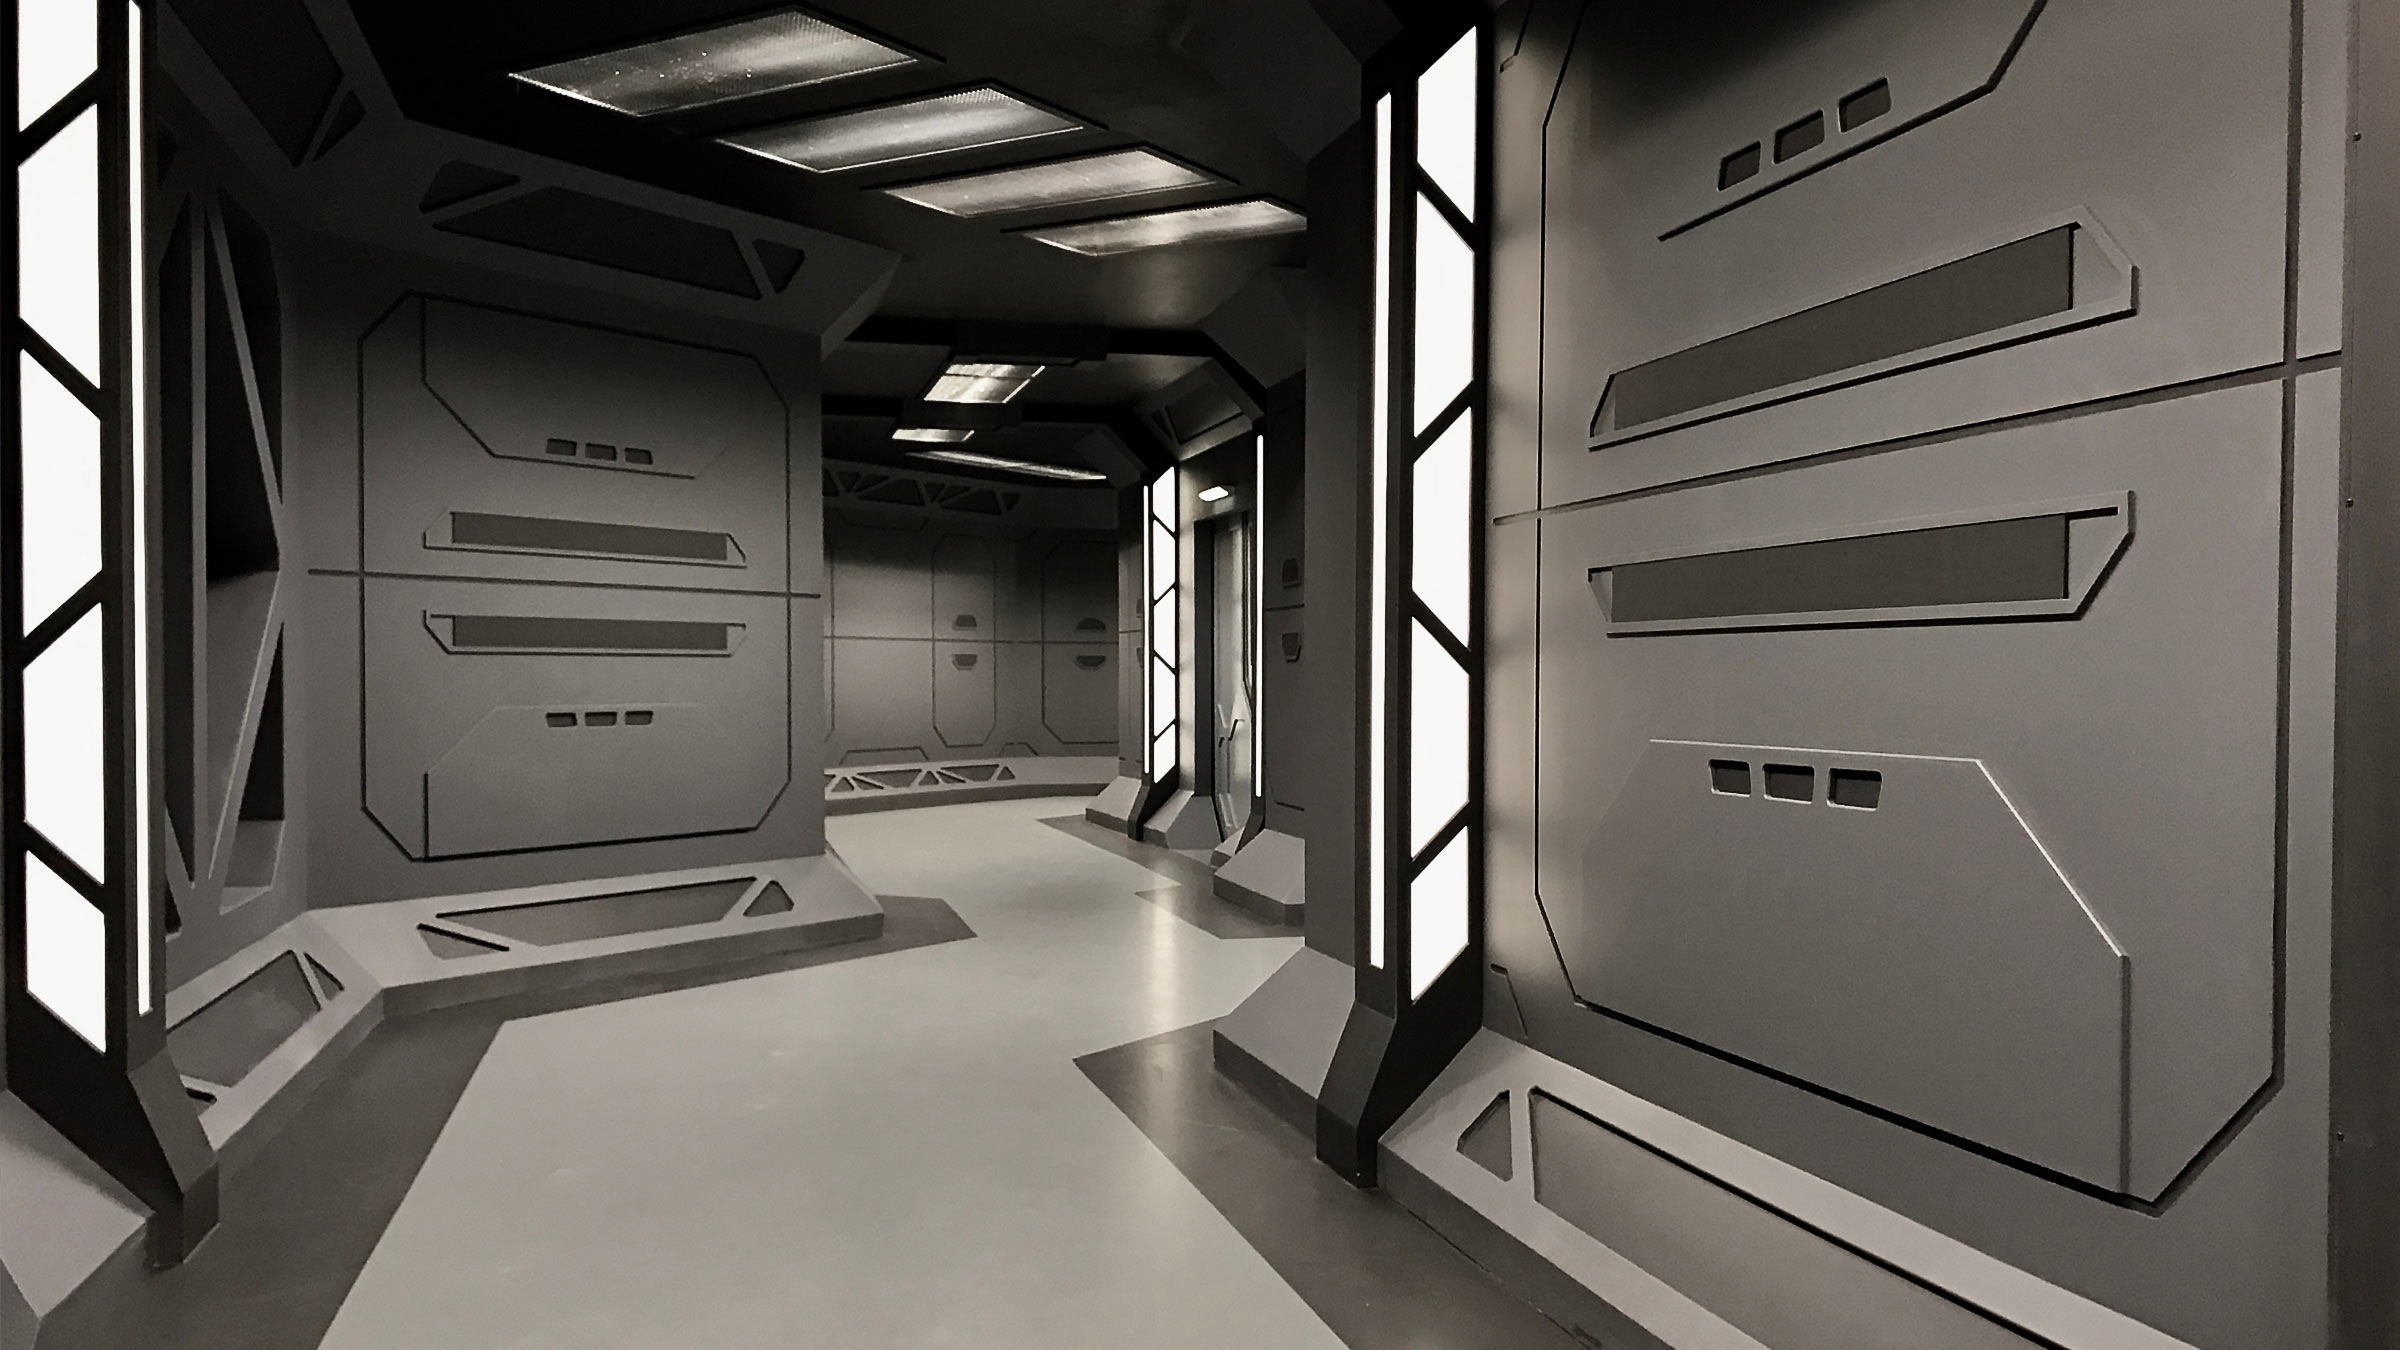 GB Hallway - Set dressing view